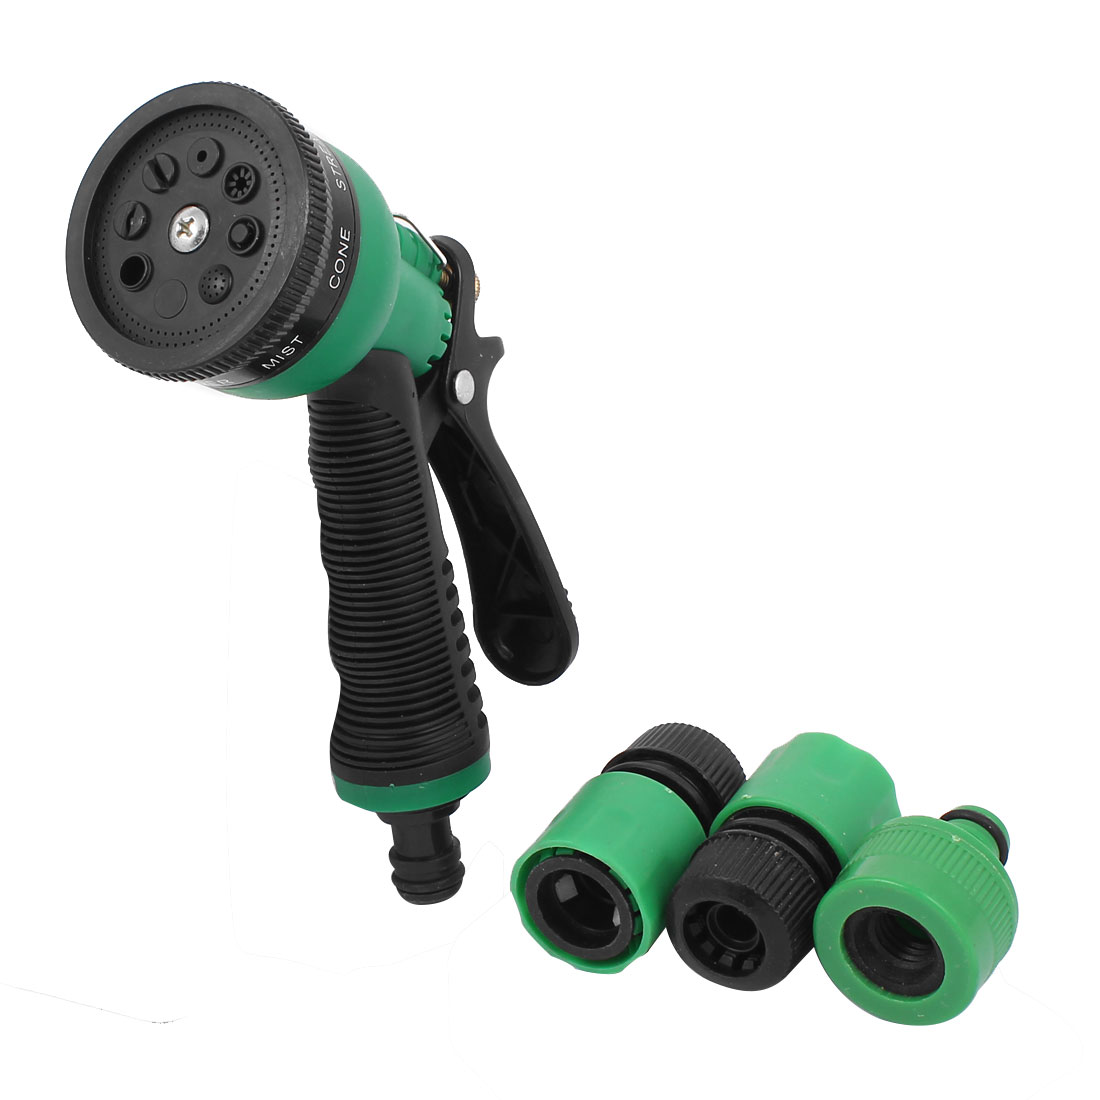 Yard Garden Plastic 8 Patterns Spray Nozzle Trigger Gun Water Hose Sprayer Green